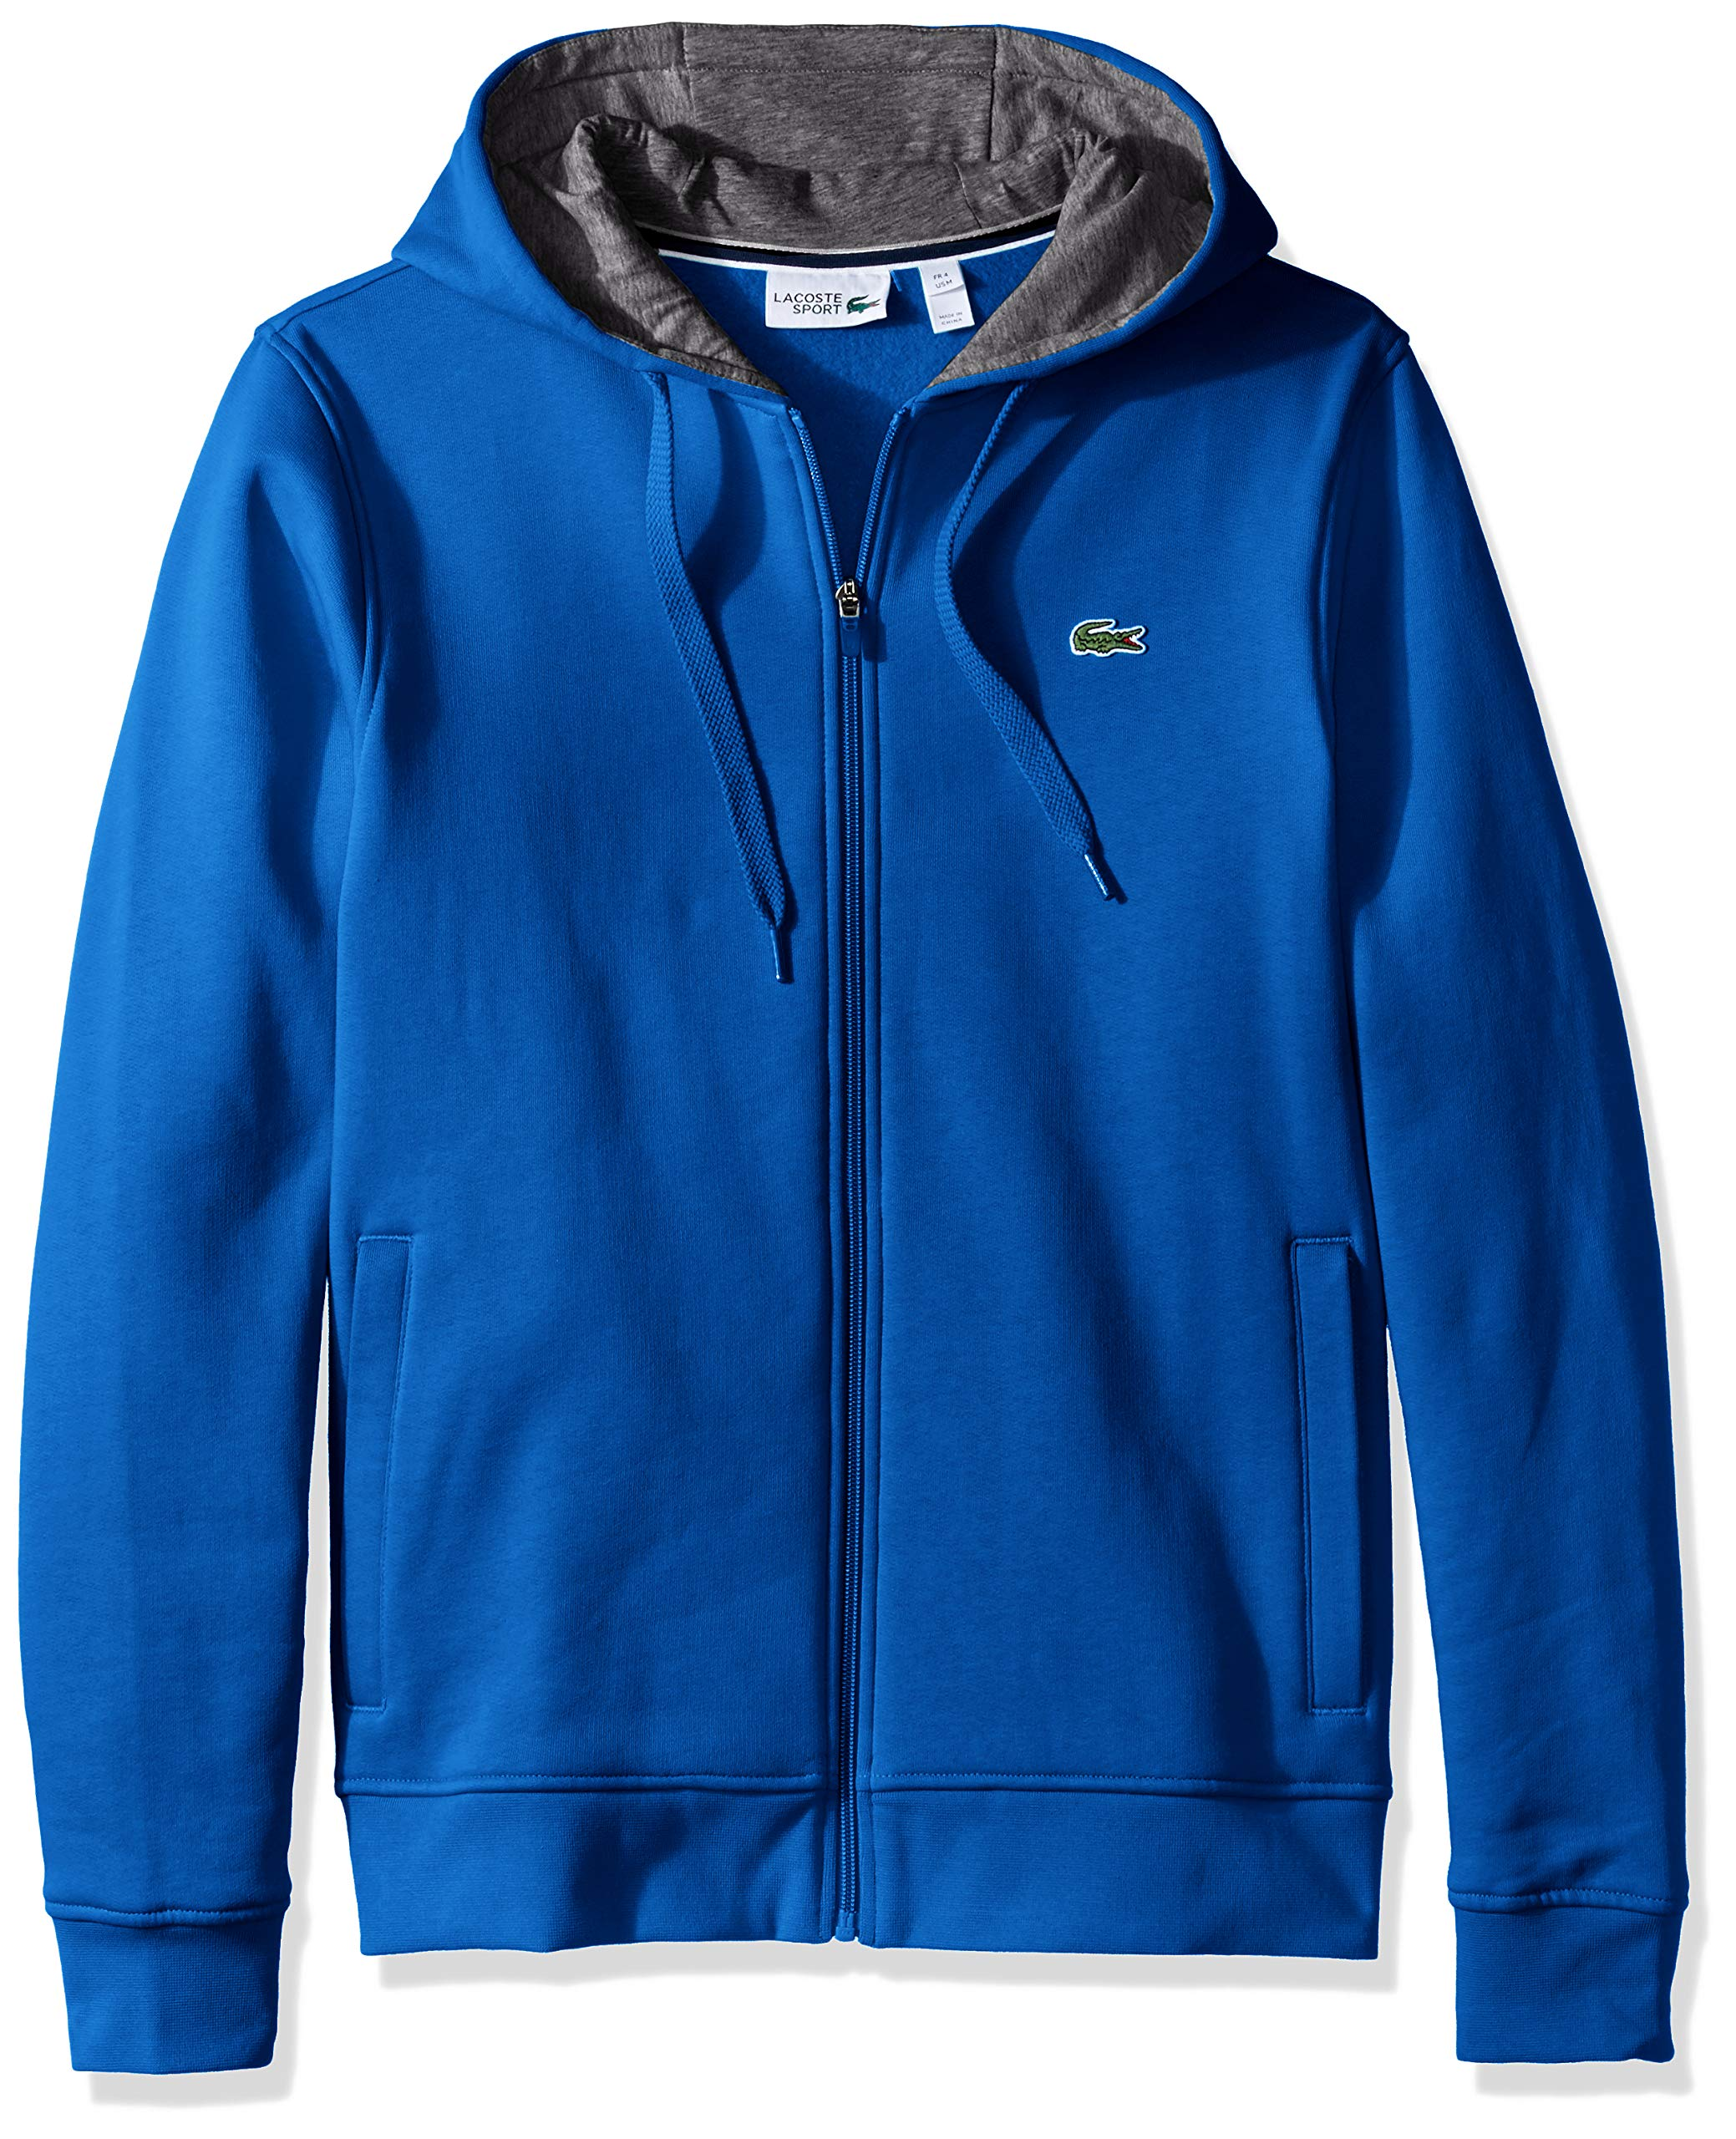 Lacoste Men's Full Zip Hoodie Fleece Sweatshirt, Blue Royal/Pitch, Small